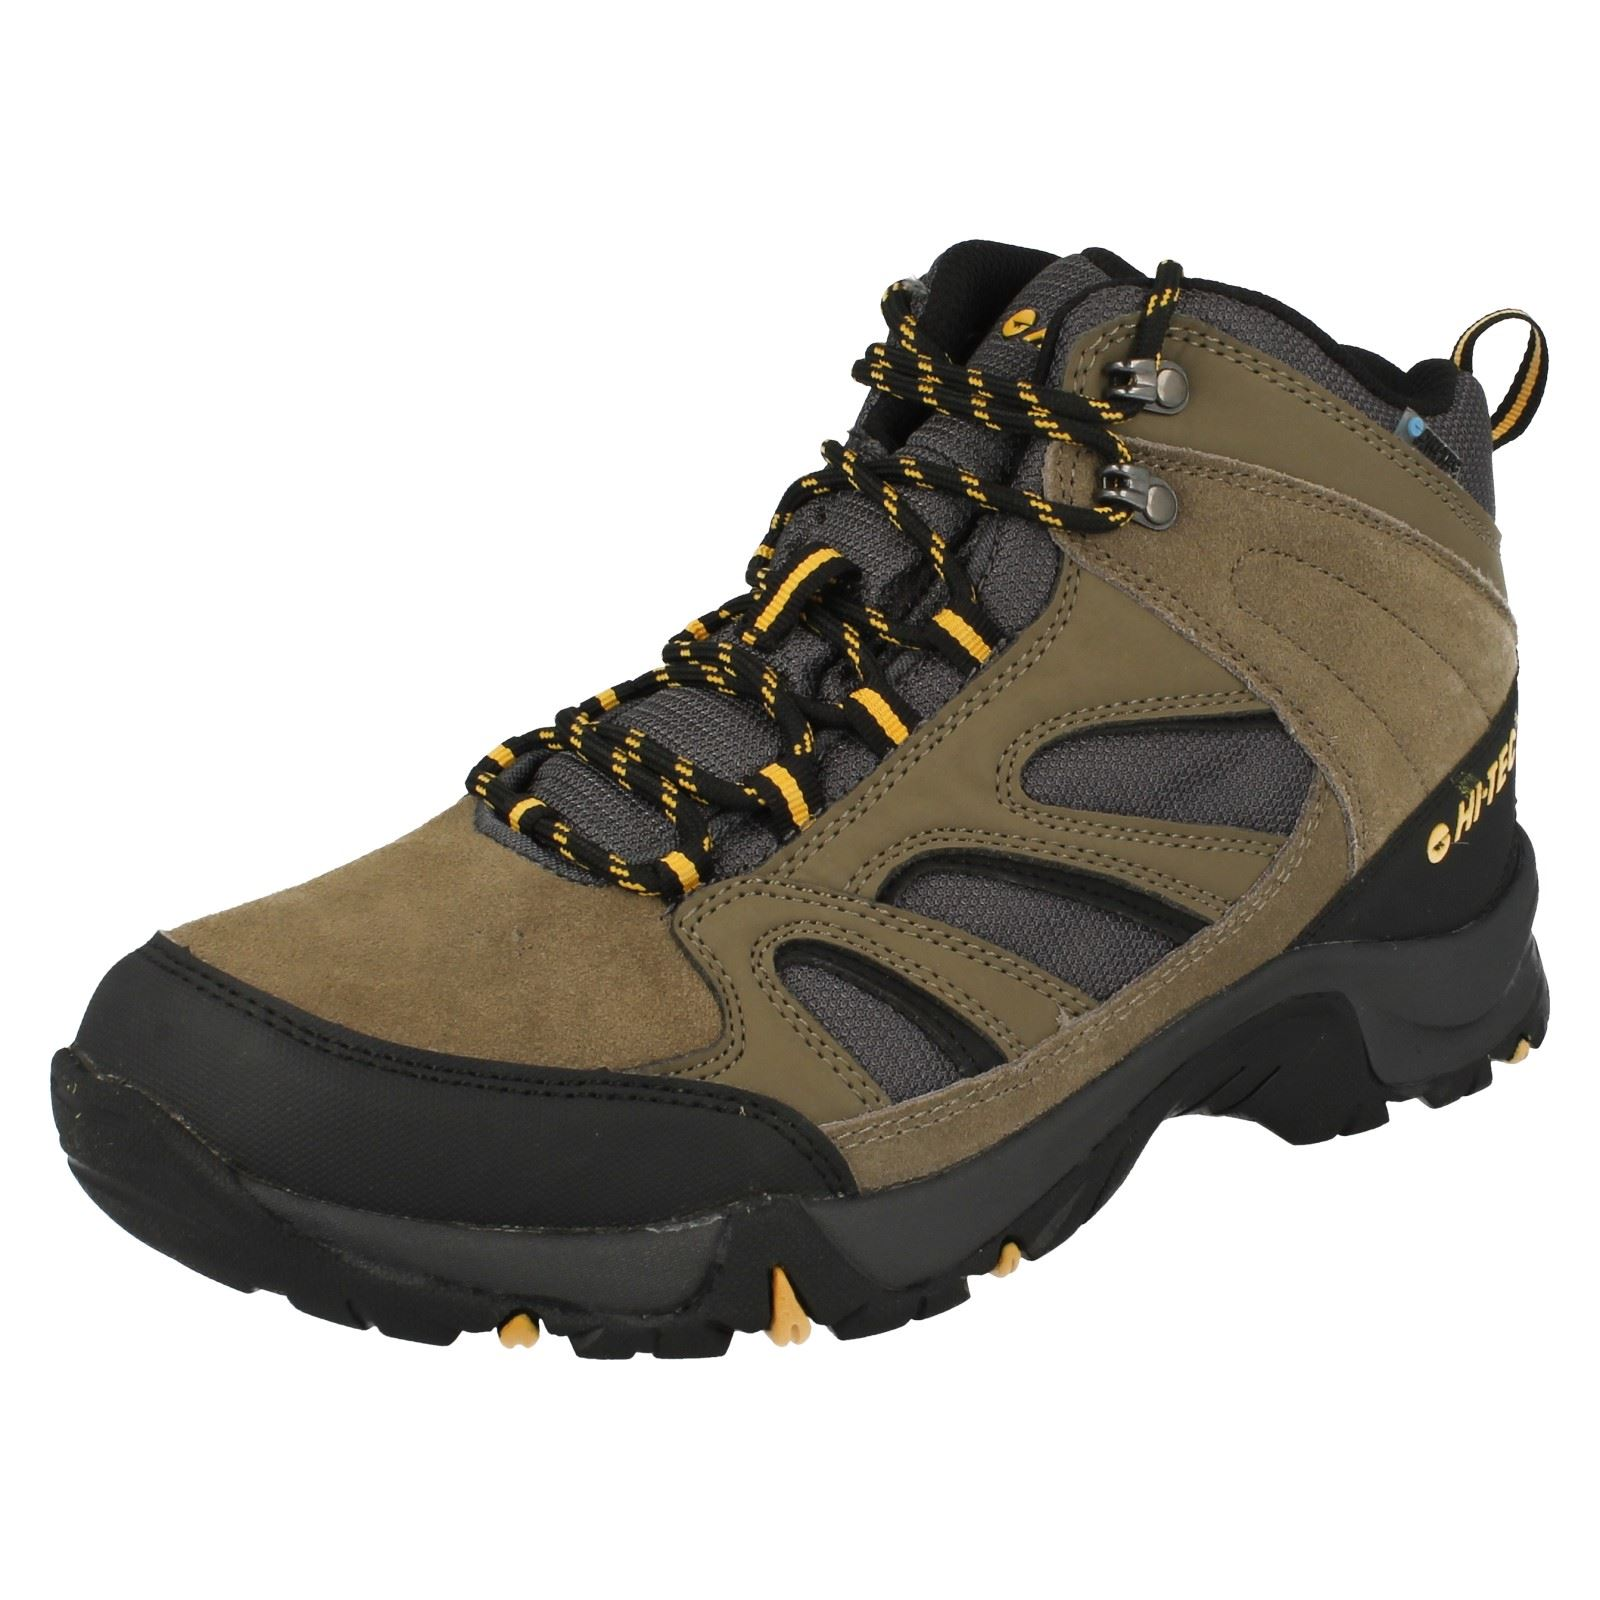 Mens Hi Tec Waterproof Walking Boots Idaho Wp Ebay